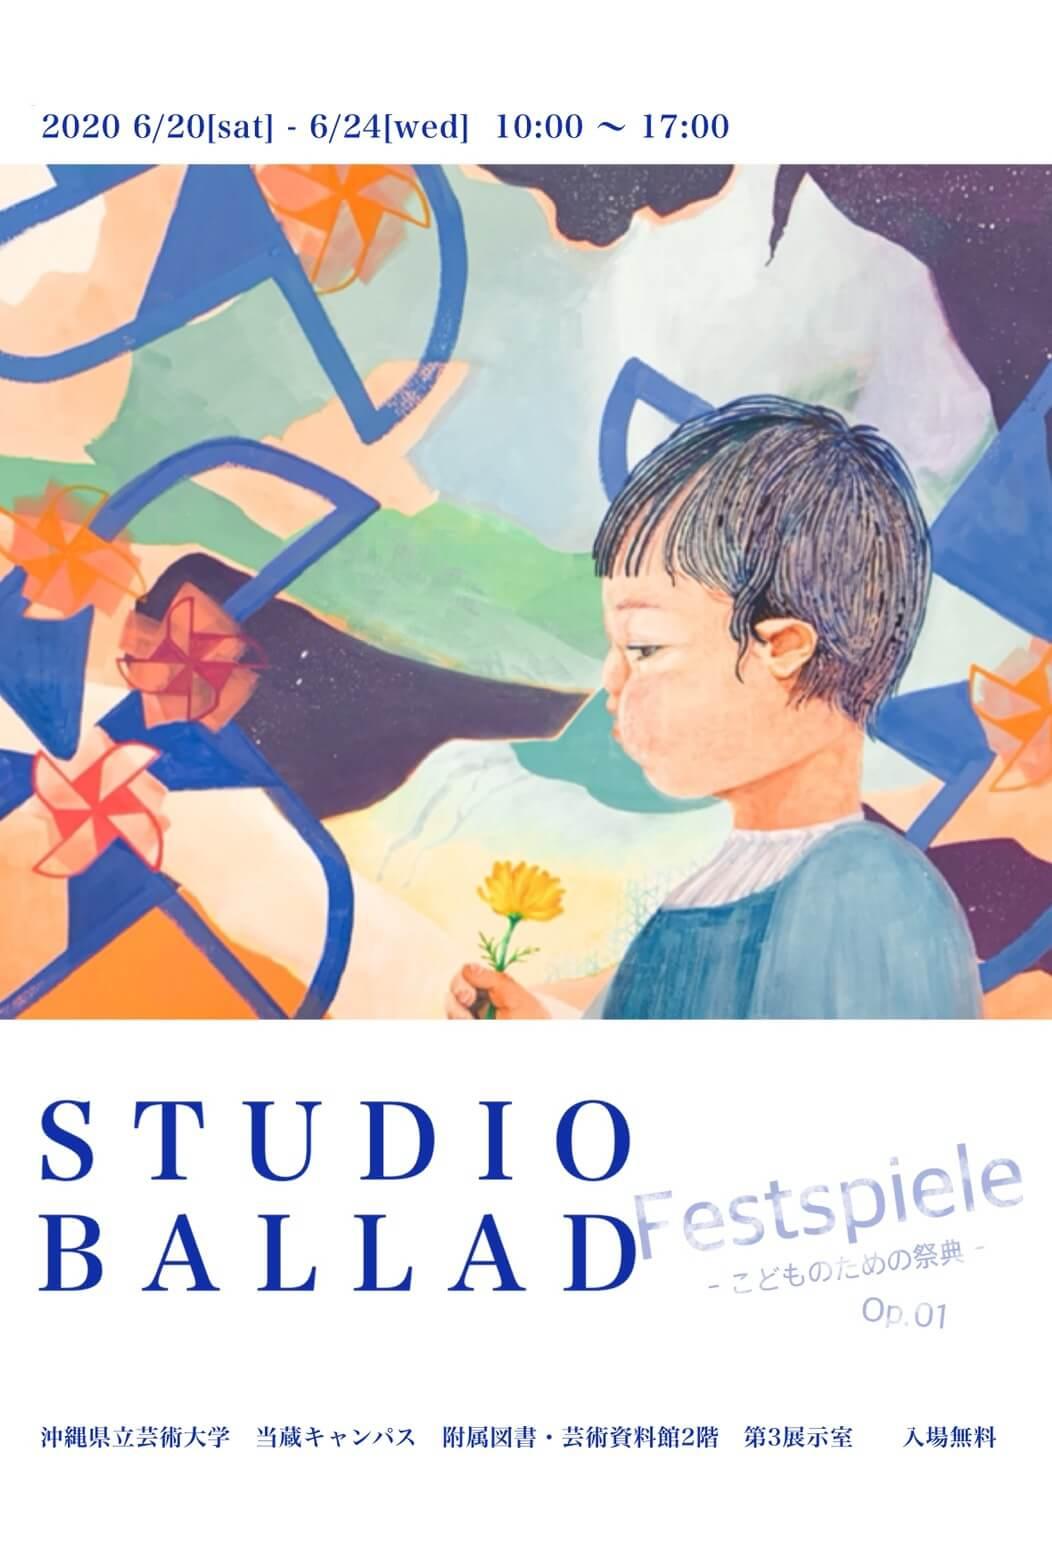 http://www.okigei.ac.jp/wp-content/uploads/2020/03/studio_ballad.jpg